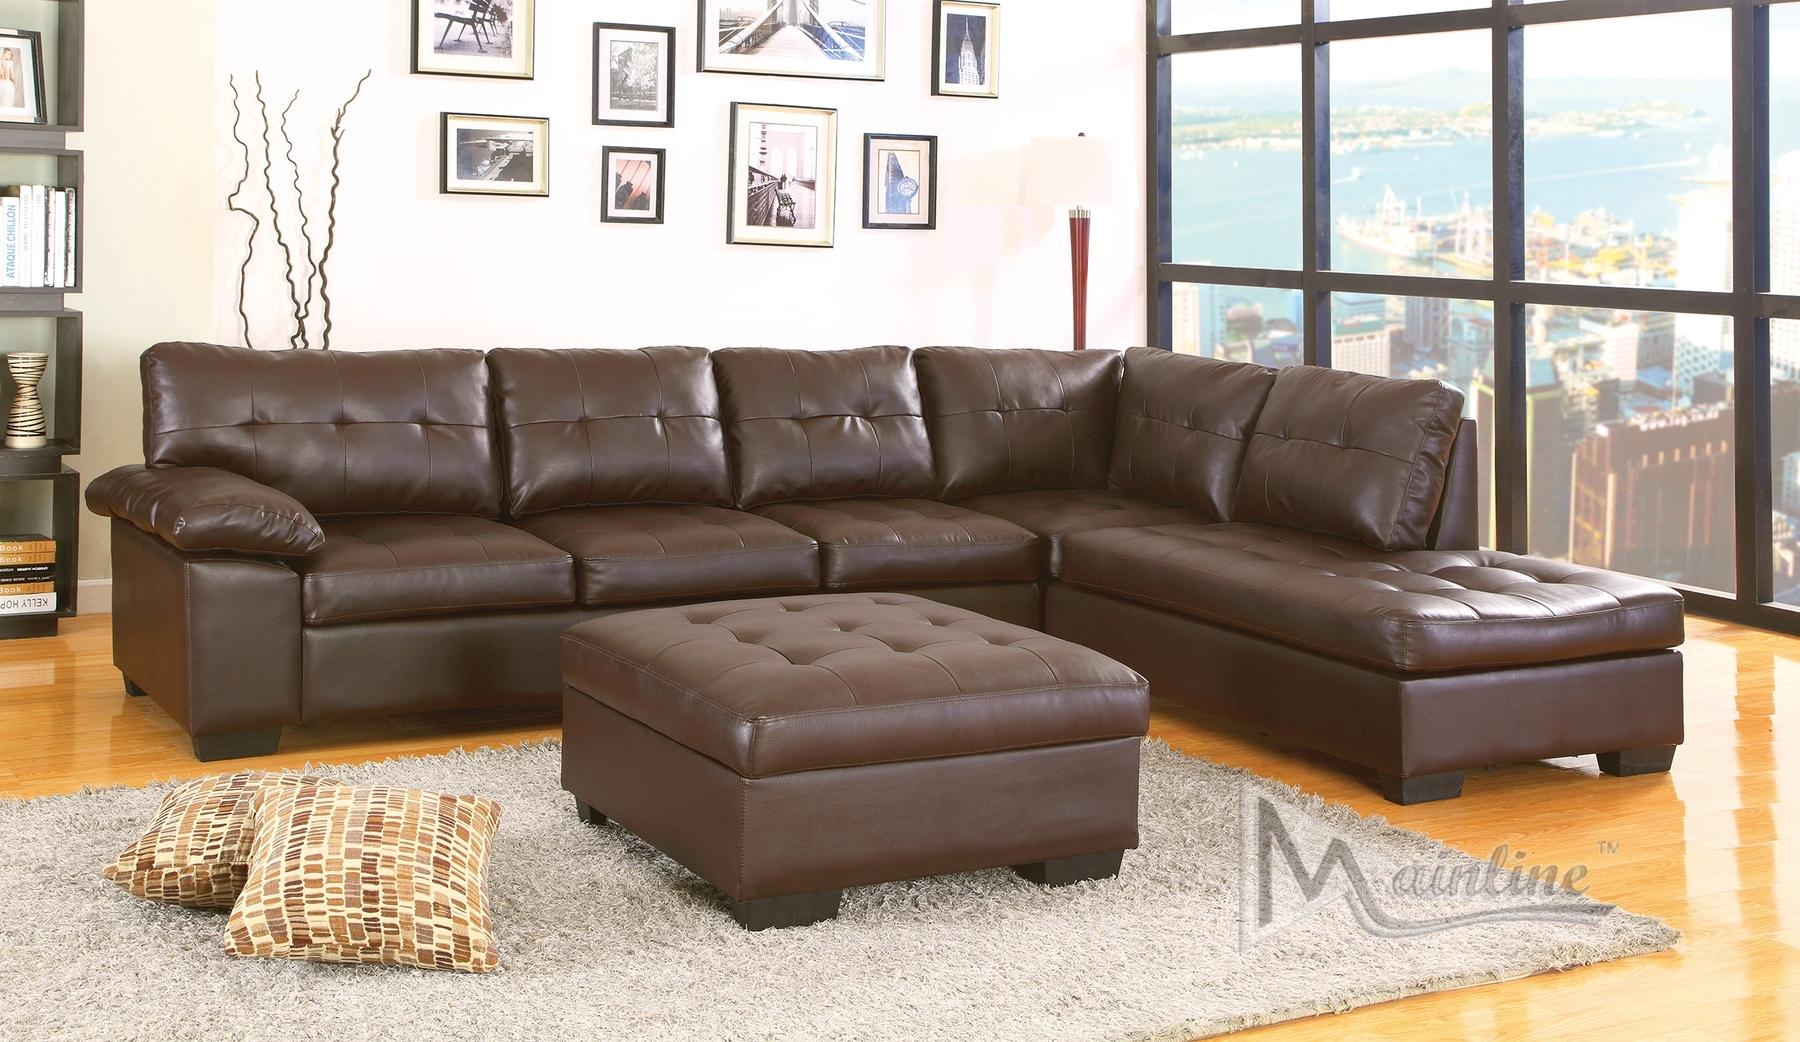 corey chocolate brown sectional sofa large oversized sofas 10 photos ideas